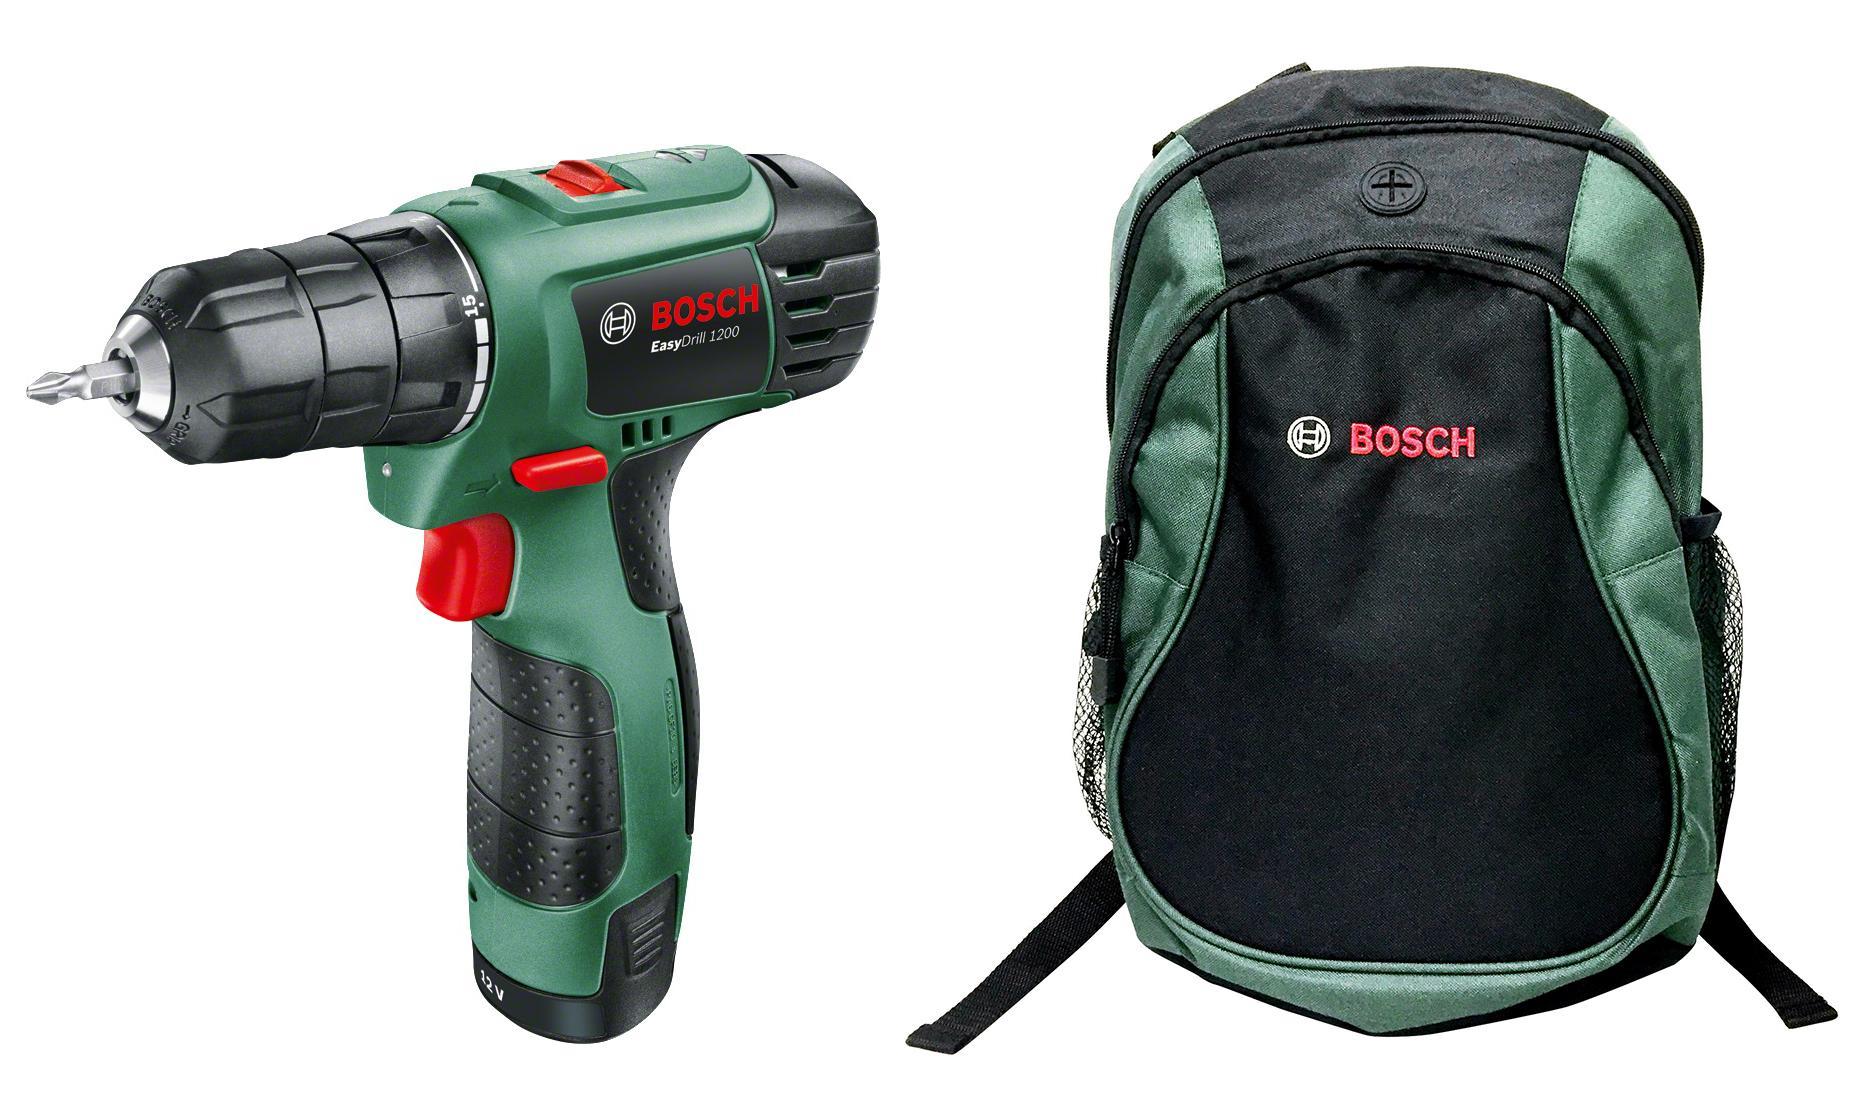 Набор Bosch Дрель-шуруповерт easydrill 1200 06039a210b + рюкзак green (1619g45200)